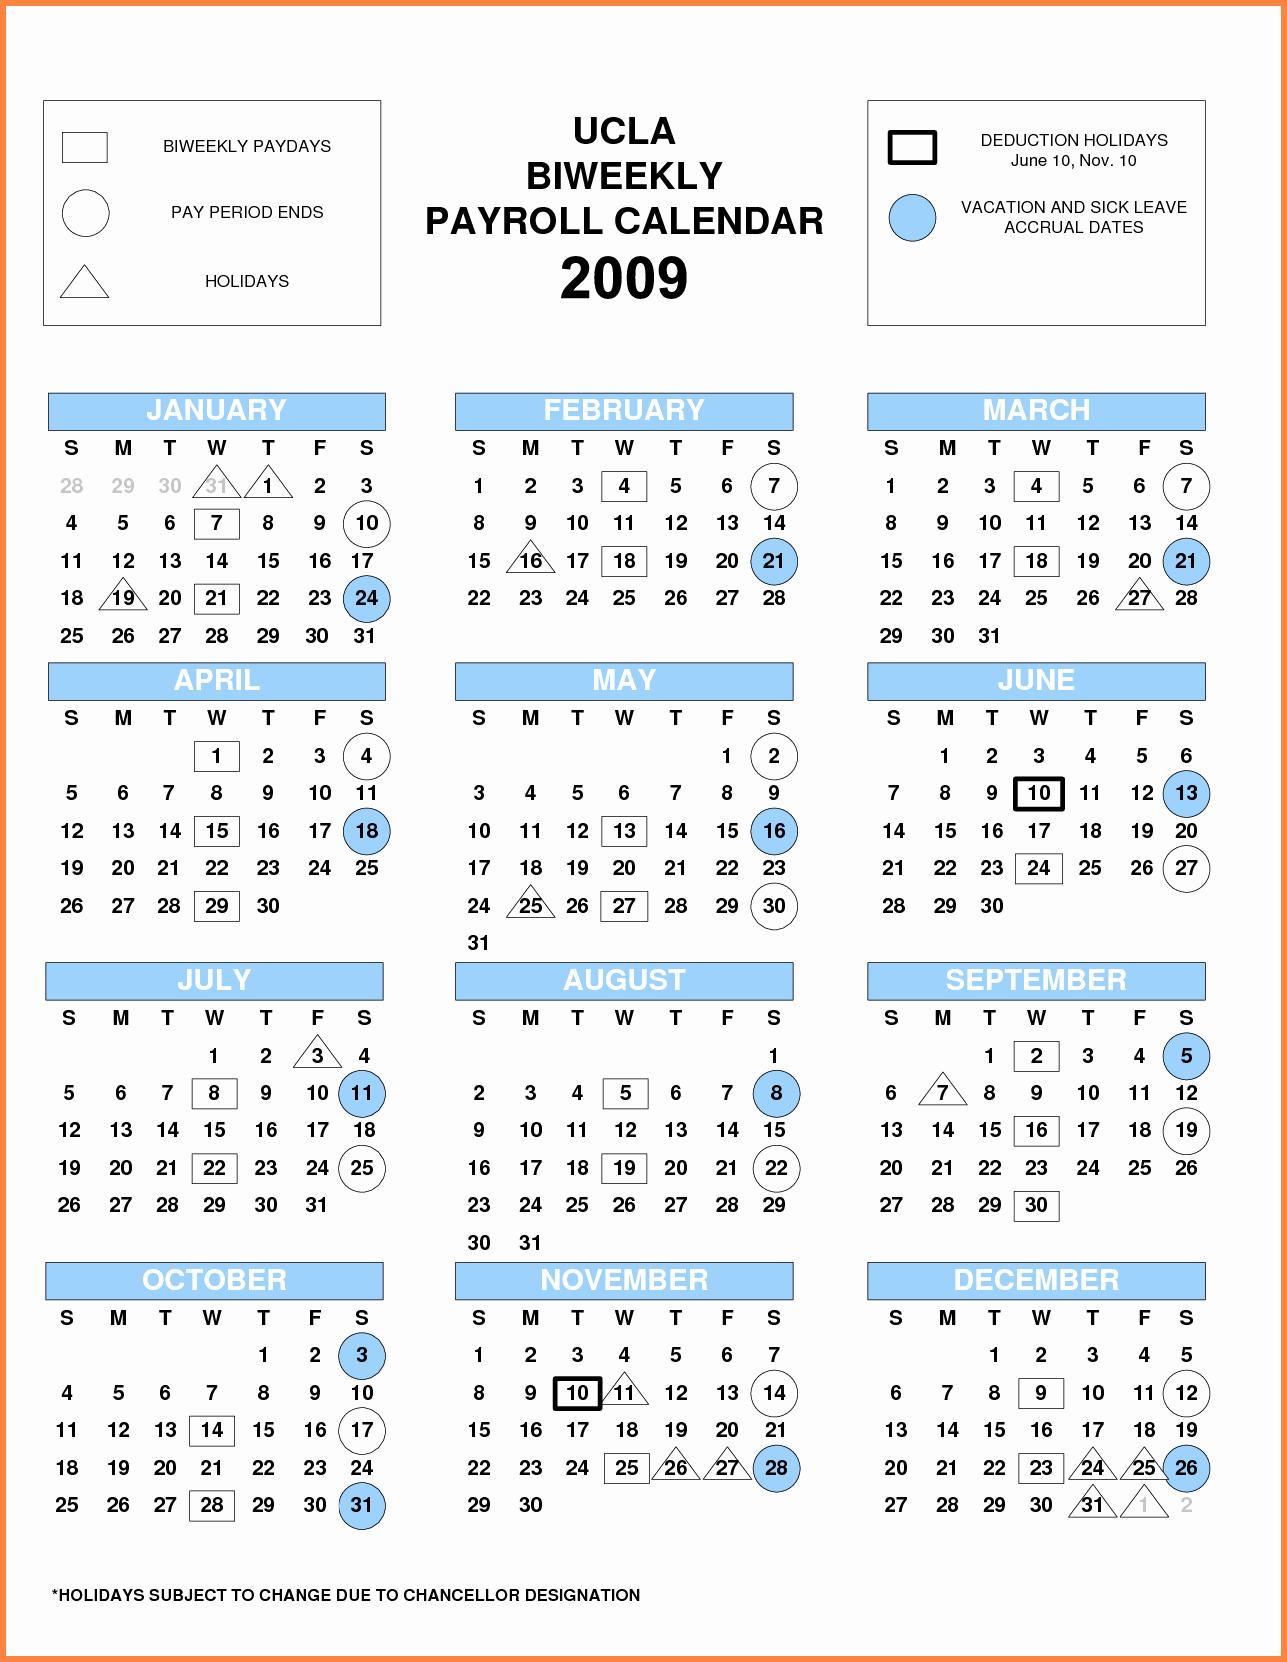 2019 Biweekly Payroll Calendar Template Elegant Pay Period Calendar Bi Weekly 2018